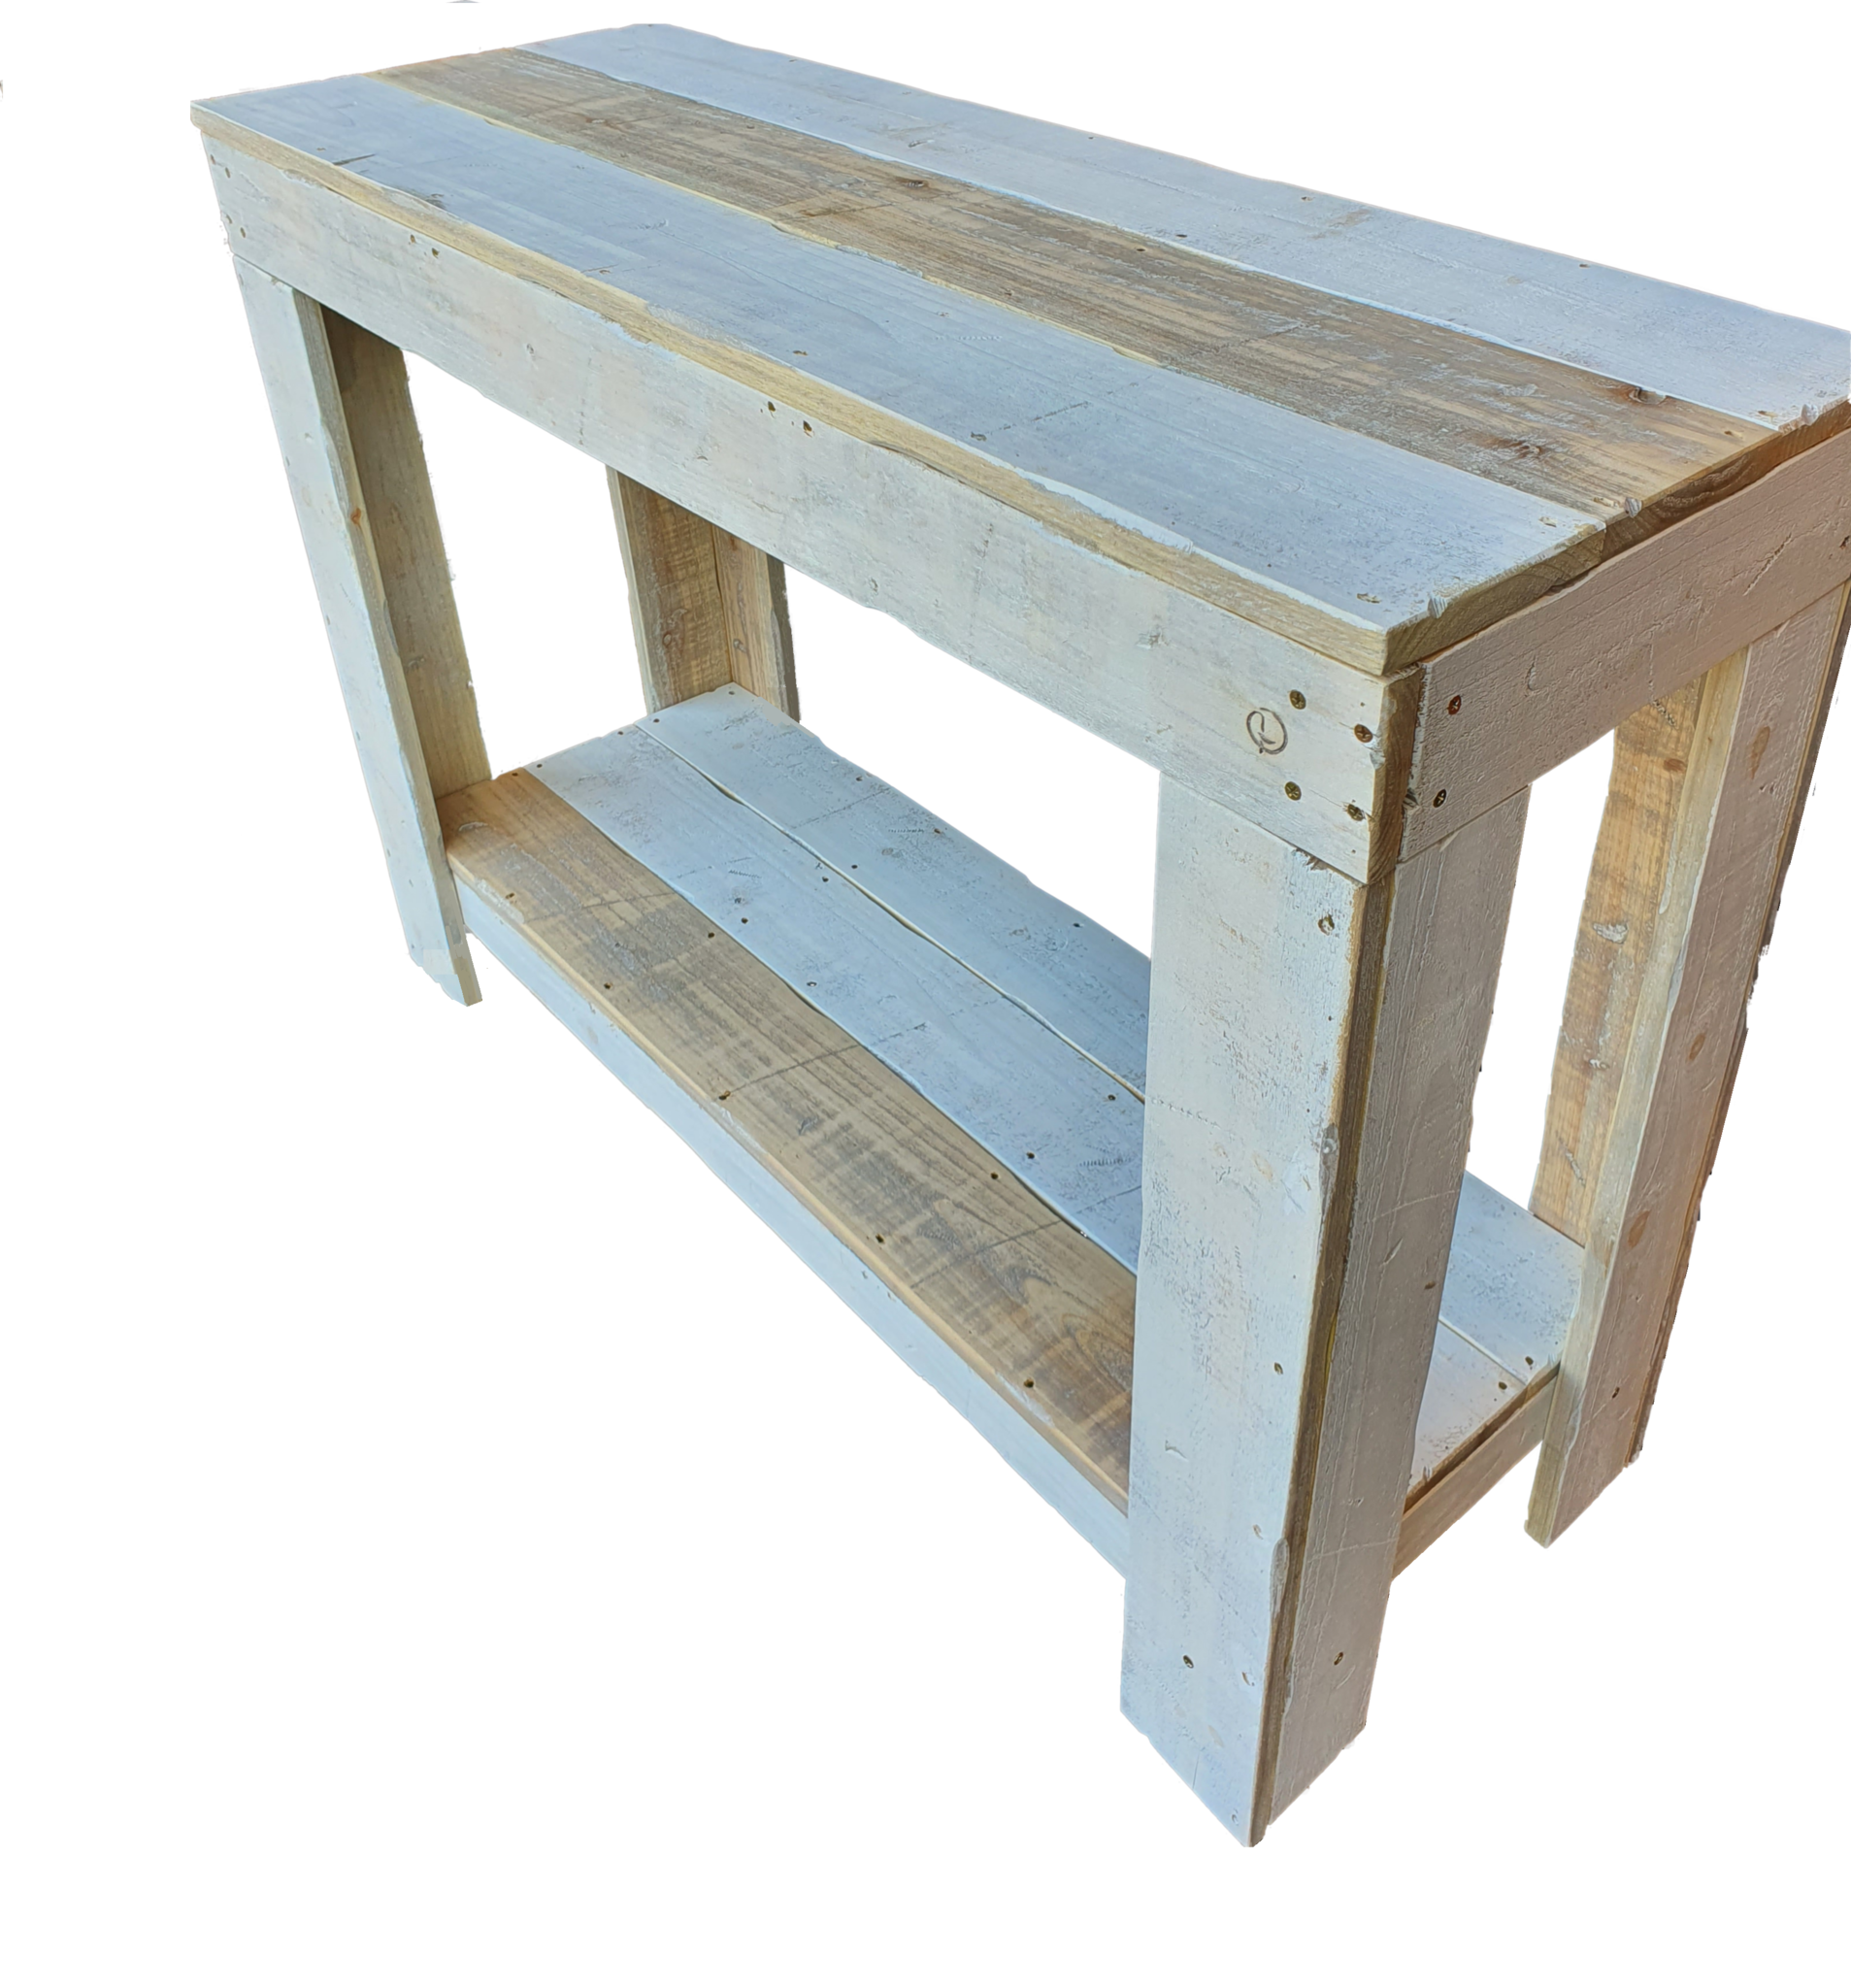 shop int ibiza white table double 110/39-2